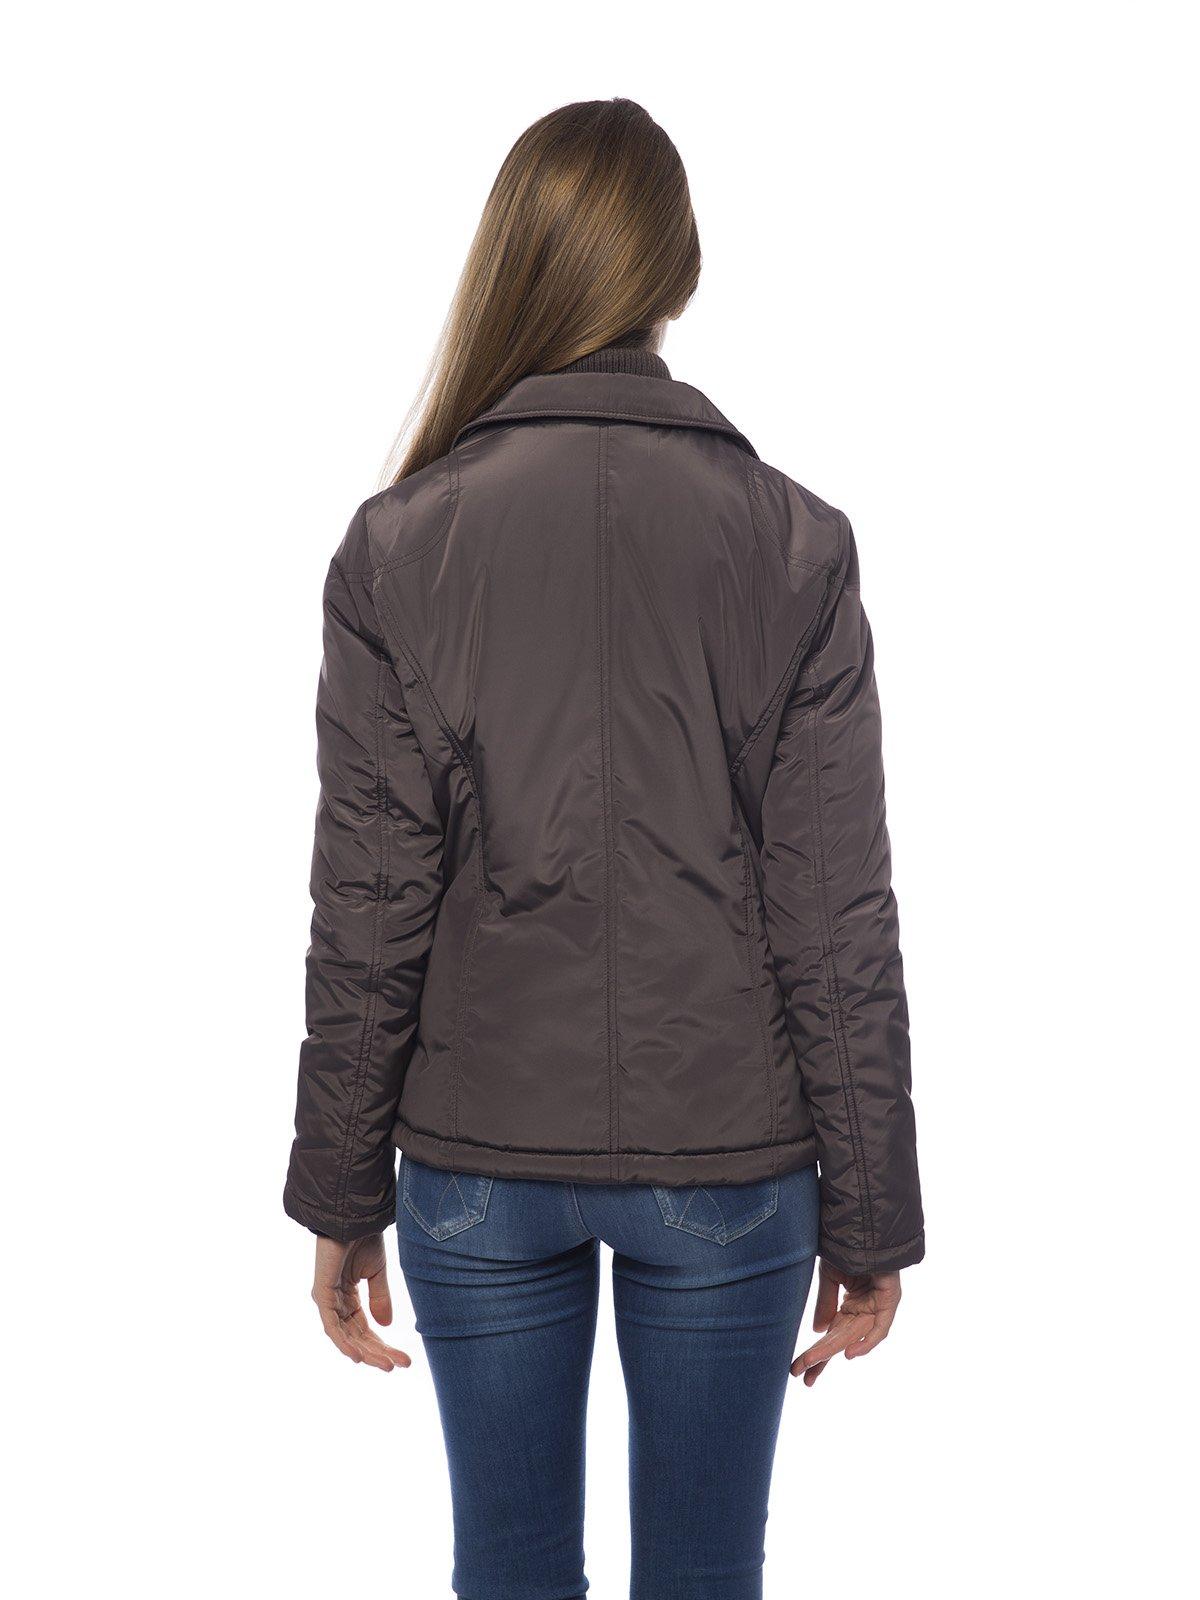 Куртка коричневая | 2716680 | фото 3